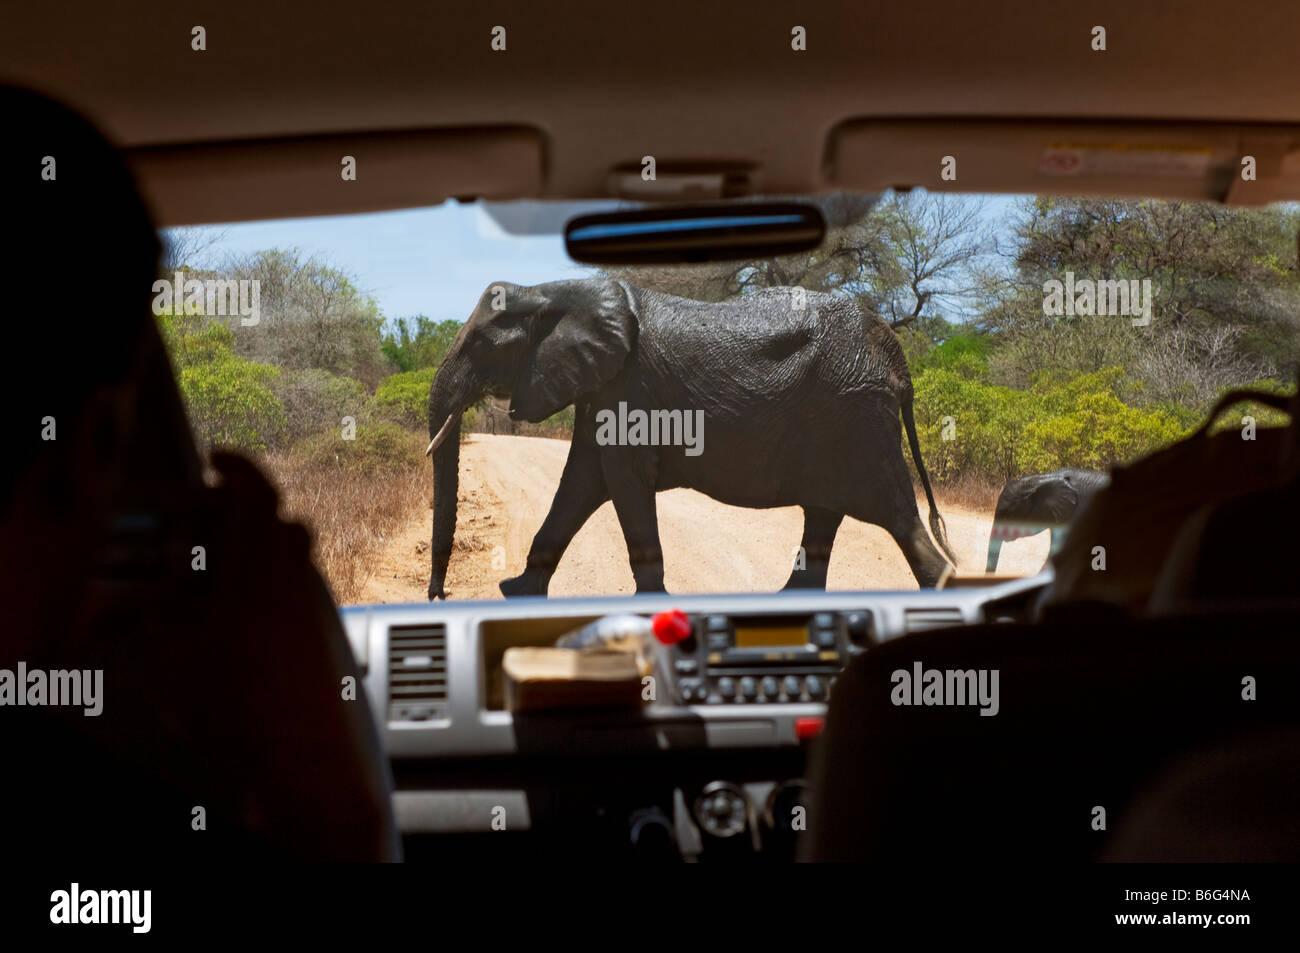 elefant crossing Game drive SAFARI in KRUGER KRÜGER NP nationalpark car vehicle jeep bus minibus national park - Stock Image